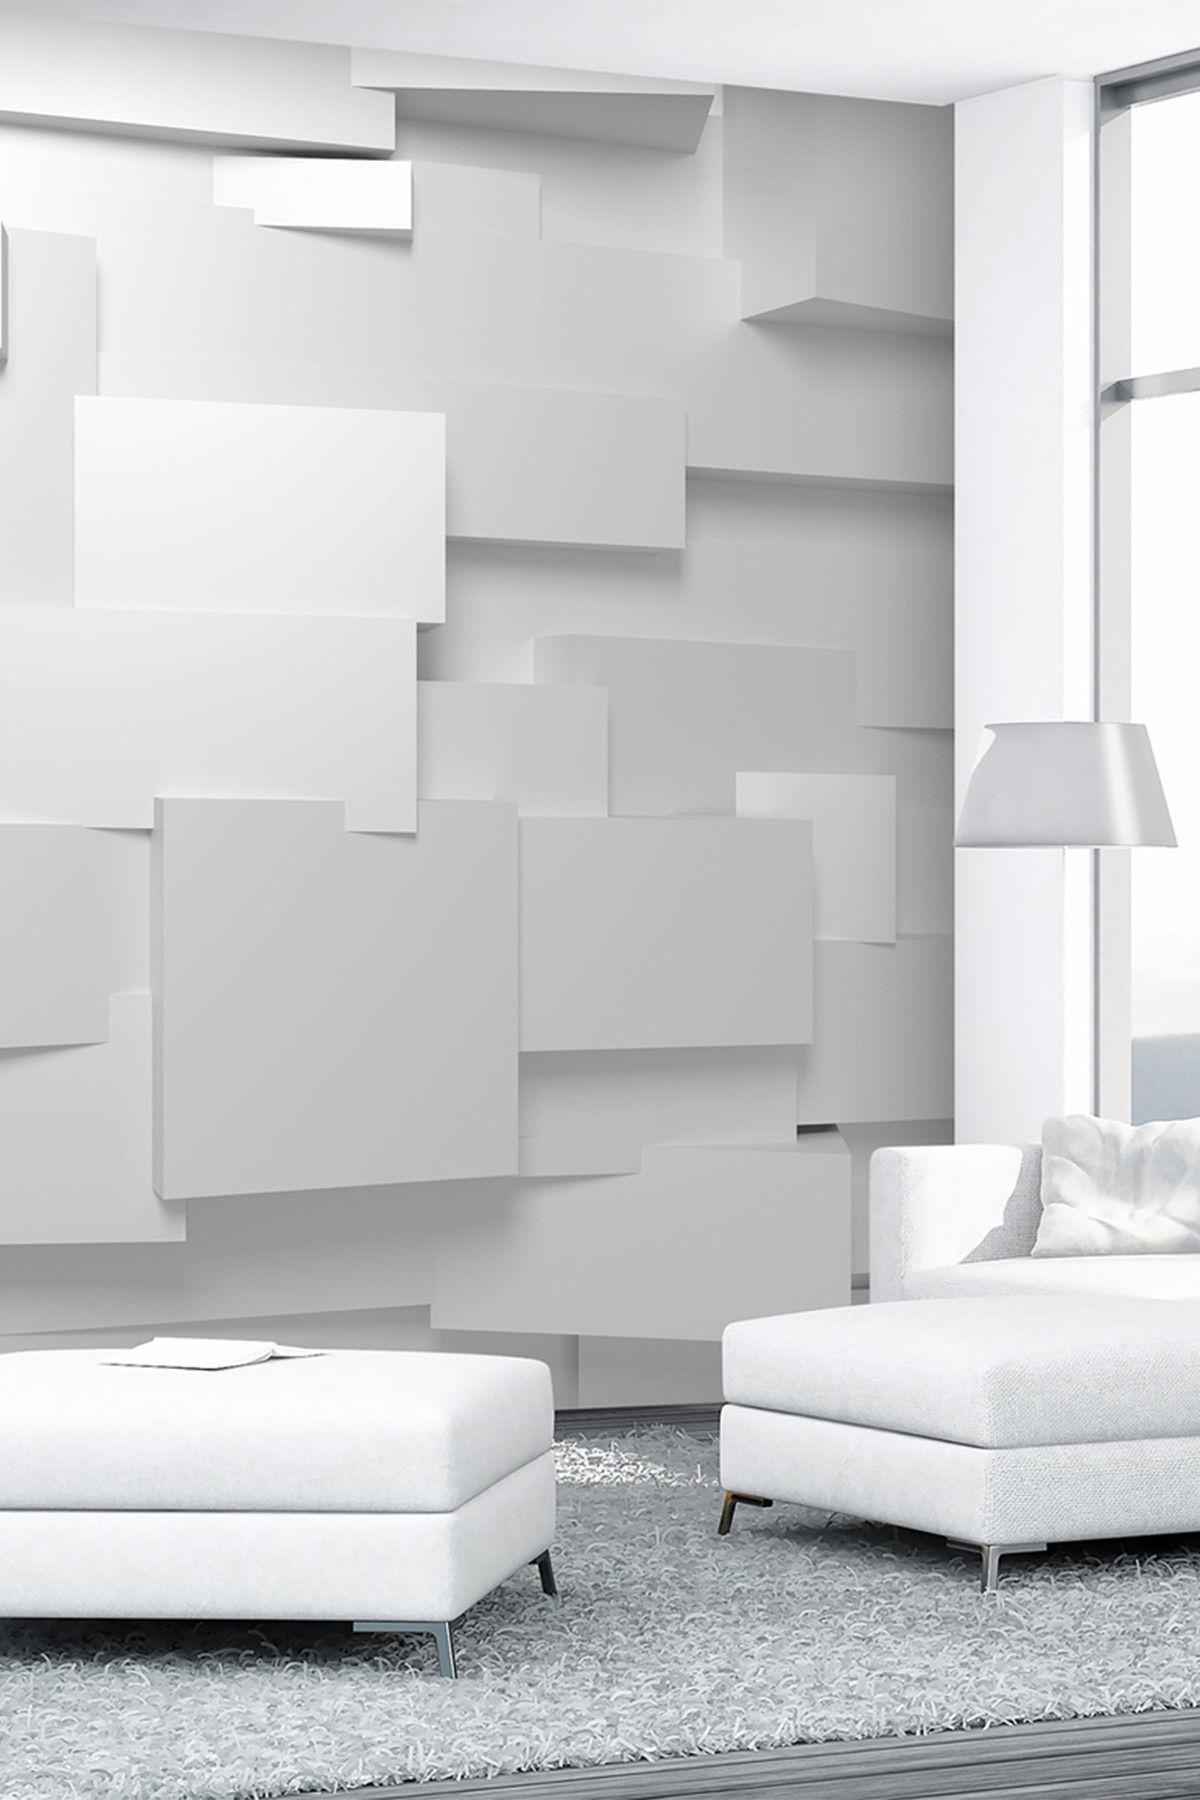 My 3d Room Design: 3D Effect 8-Panel Wall Mural